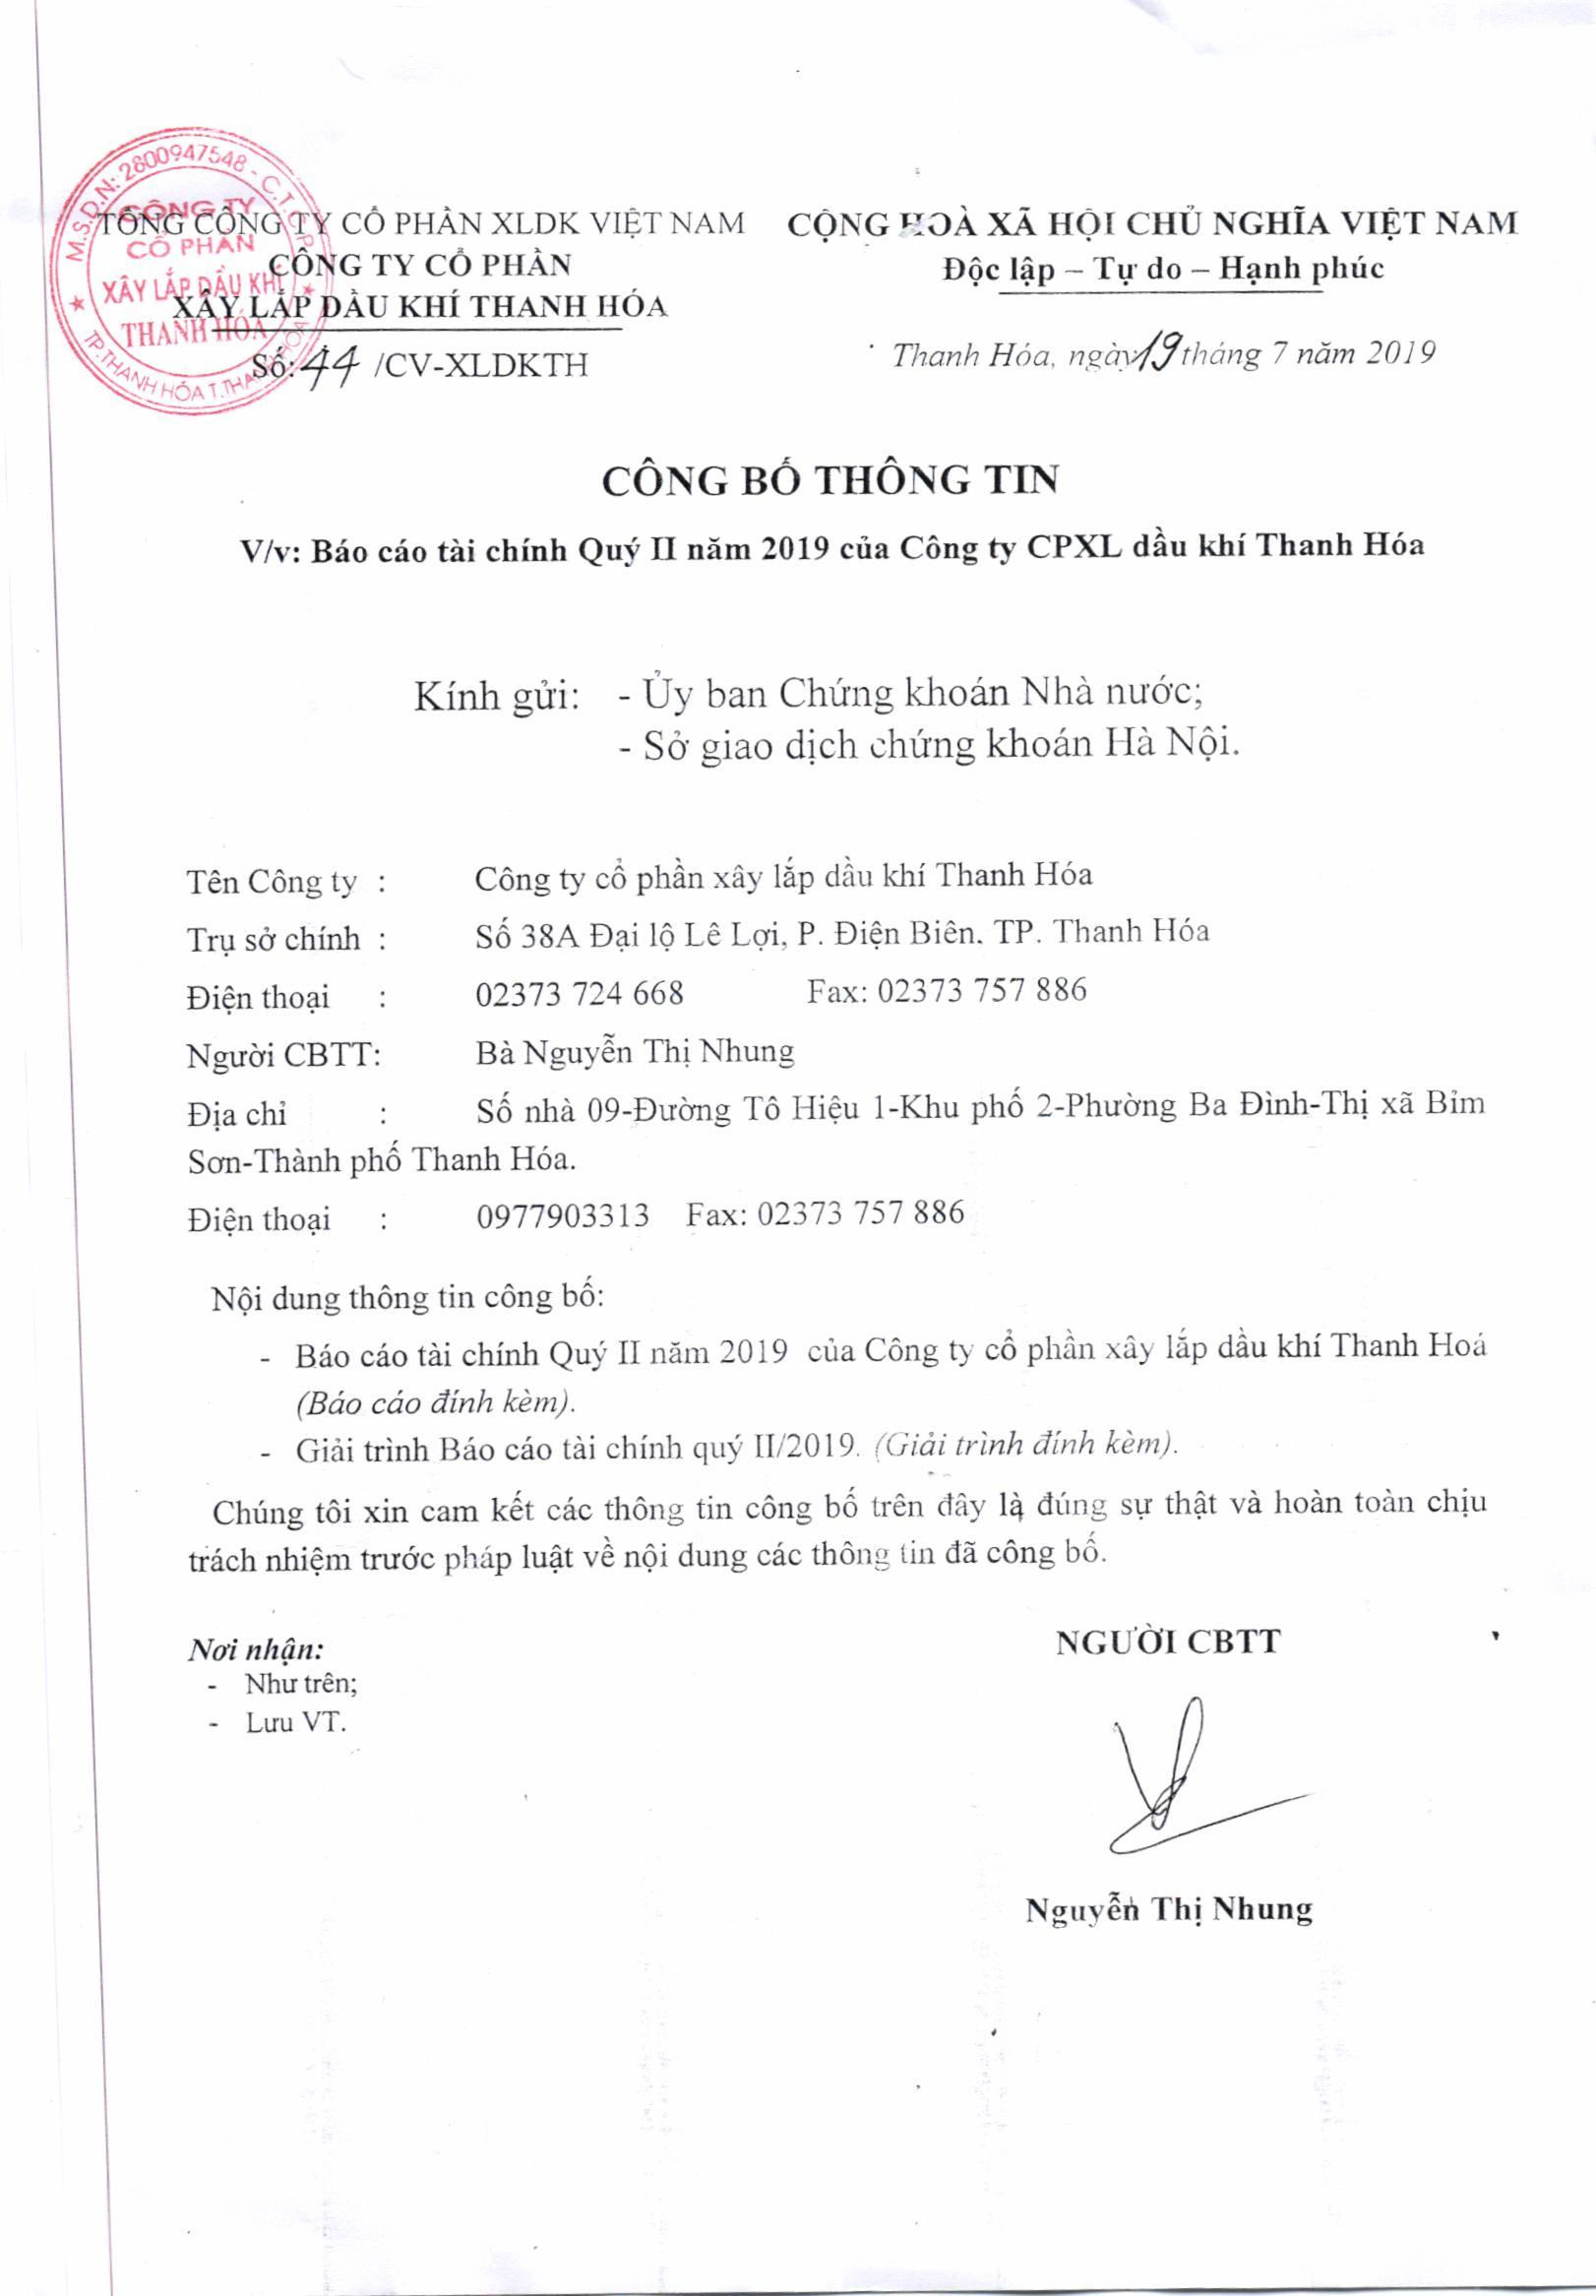 44- Cong bo thong tin BCTC Quy II-2019 (1)